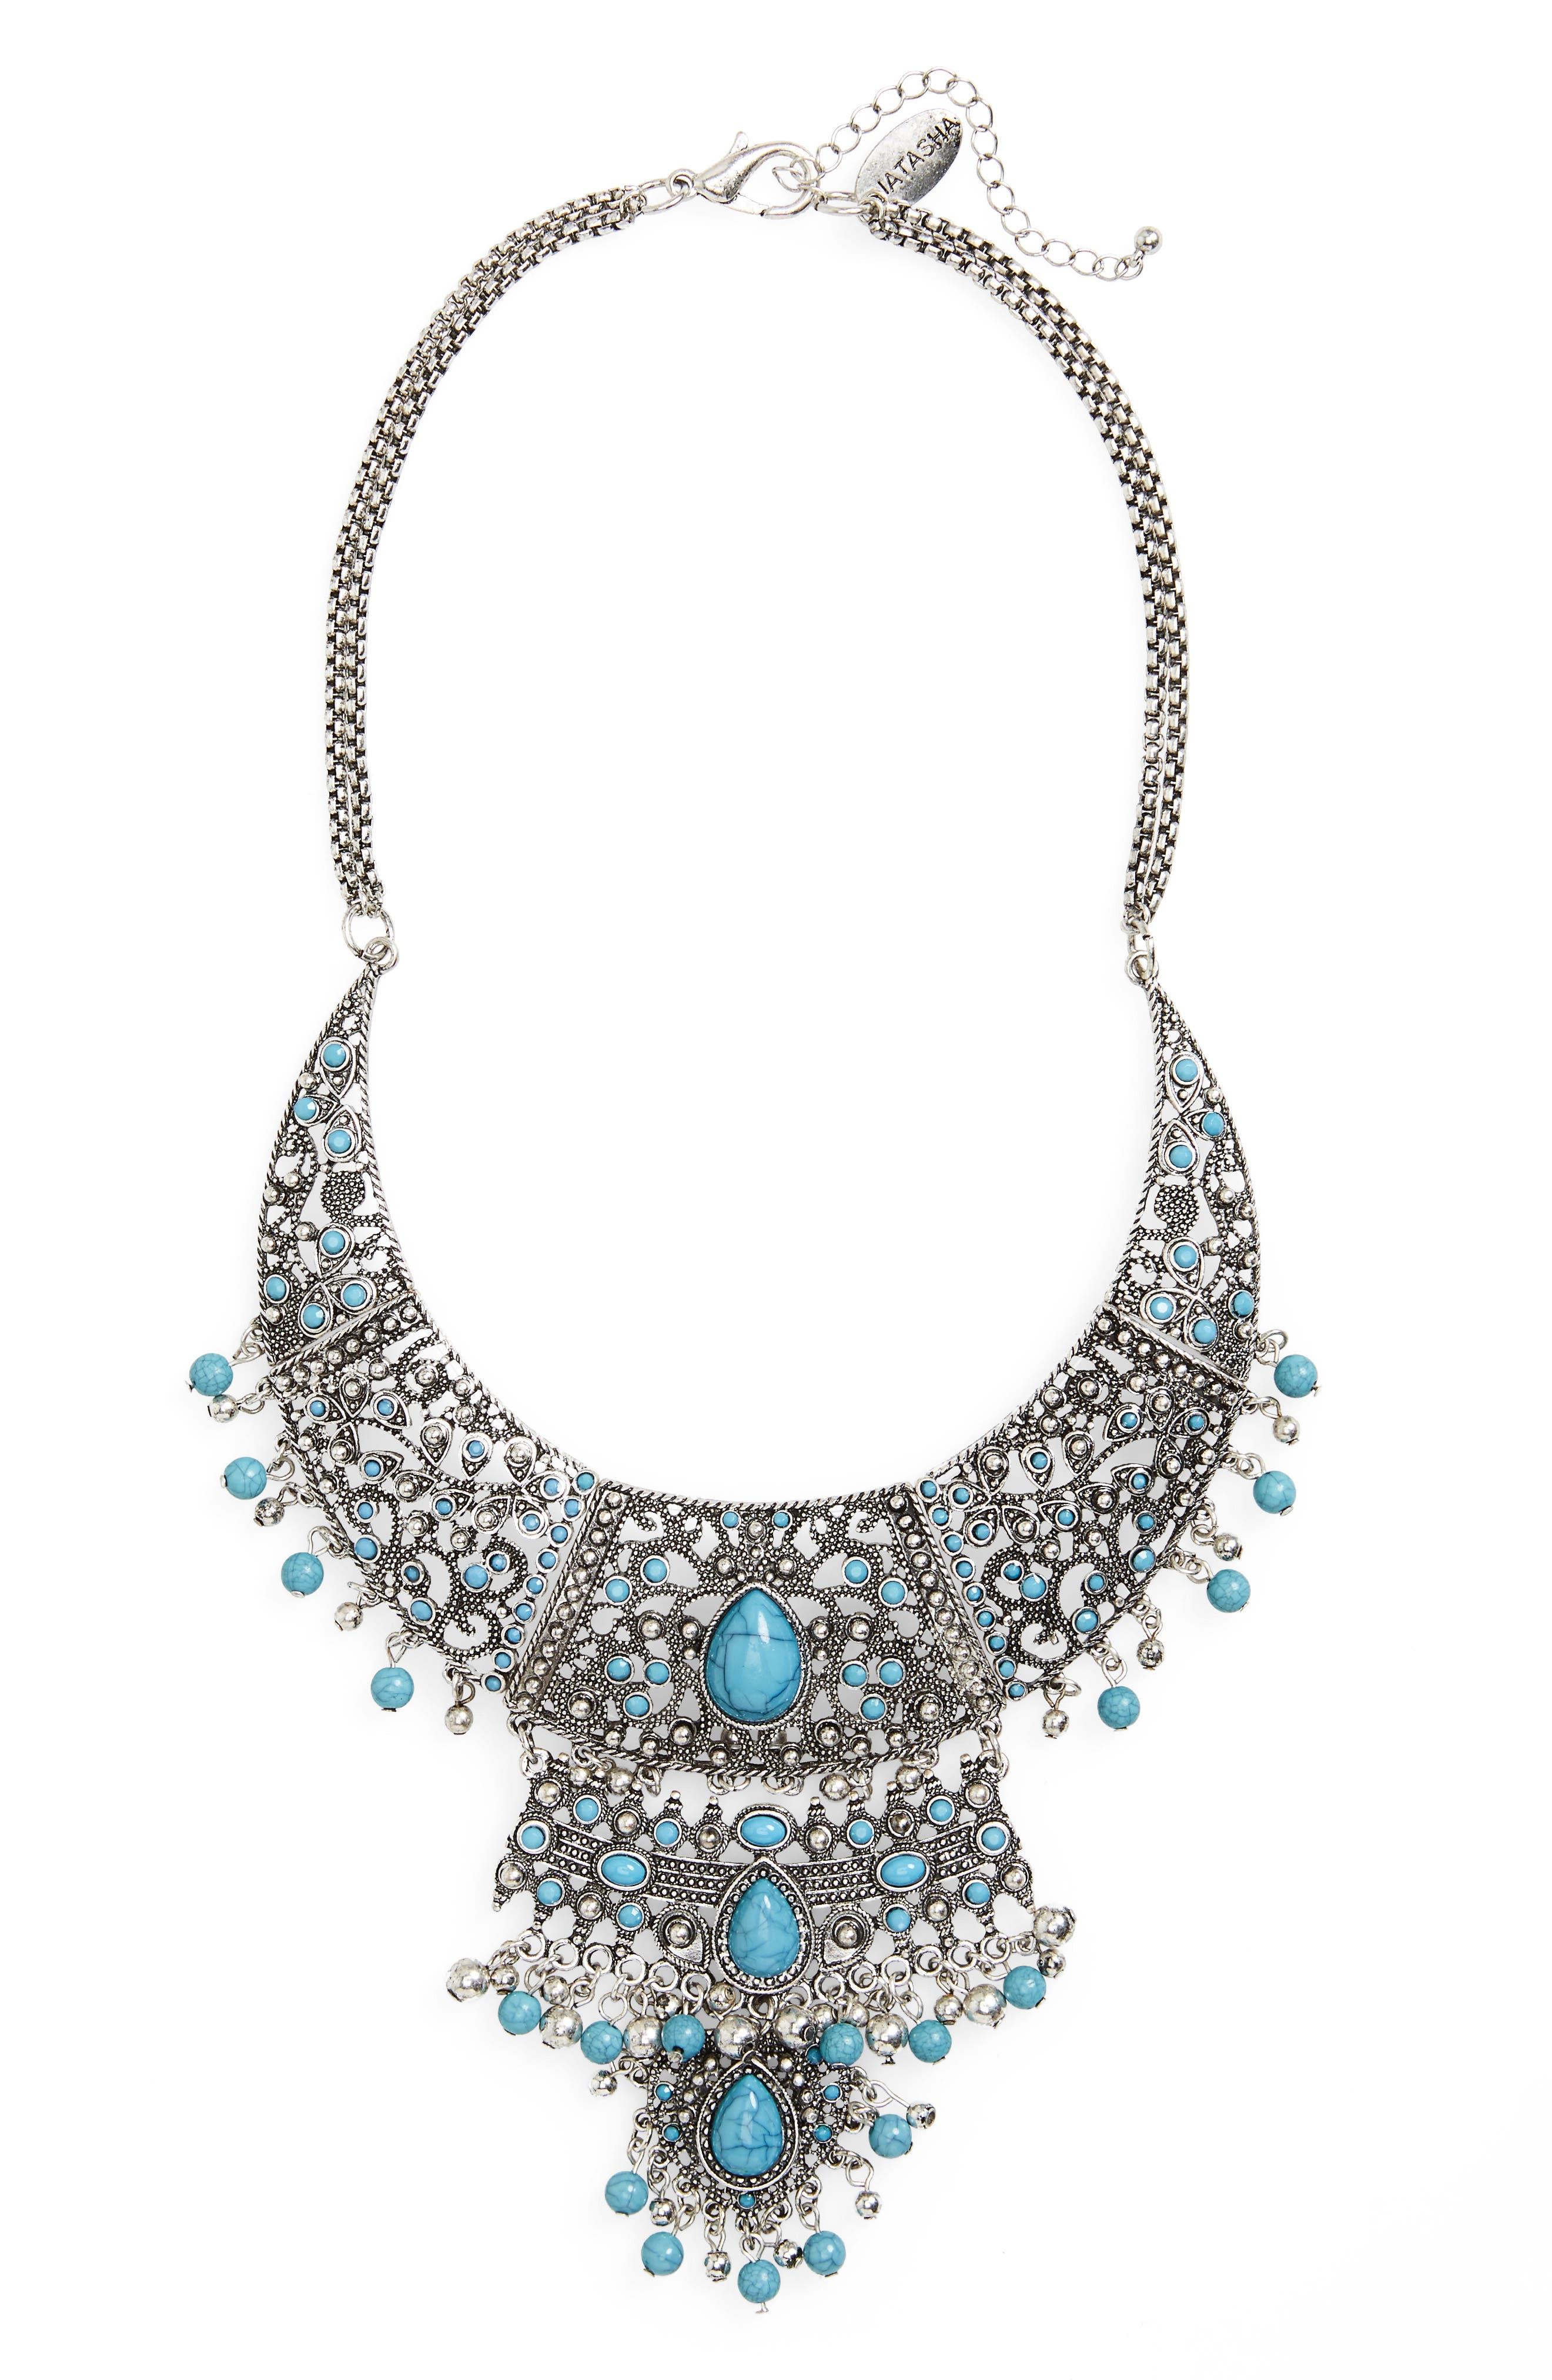 Natasha Couture Statement Necklace